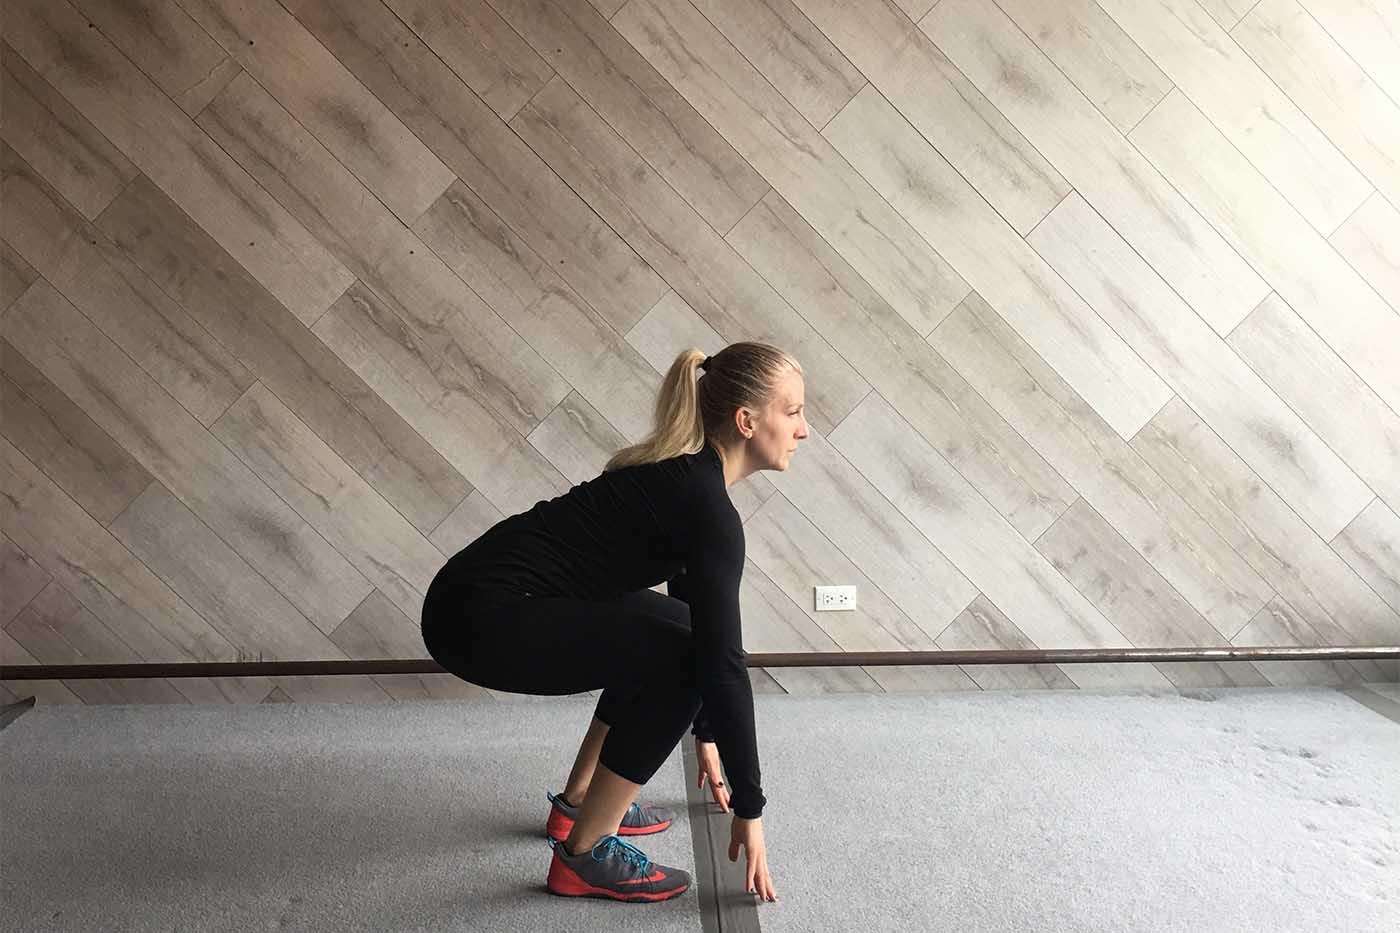 asweatlife_treadmill-challenge_burpee-4